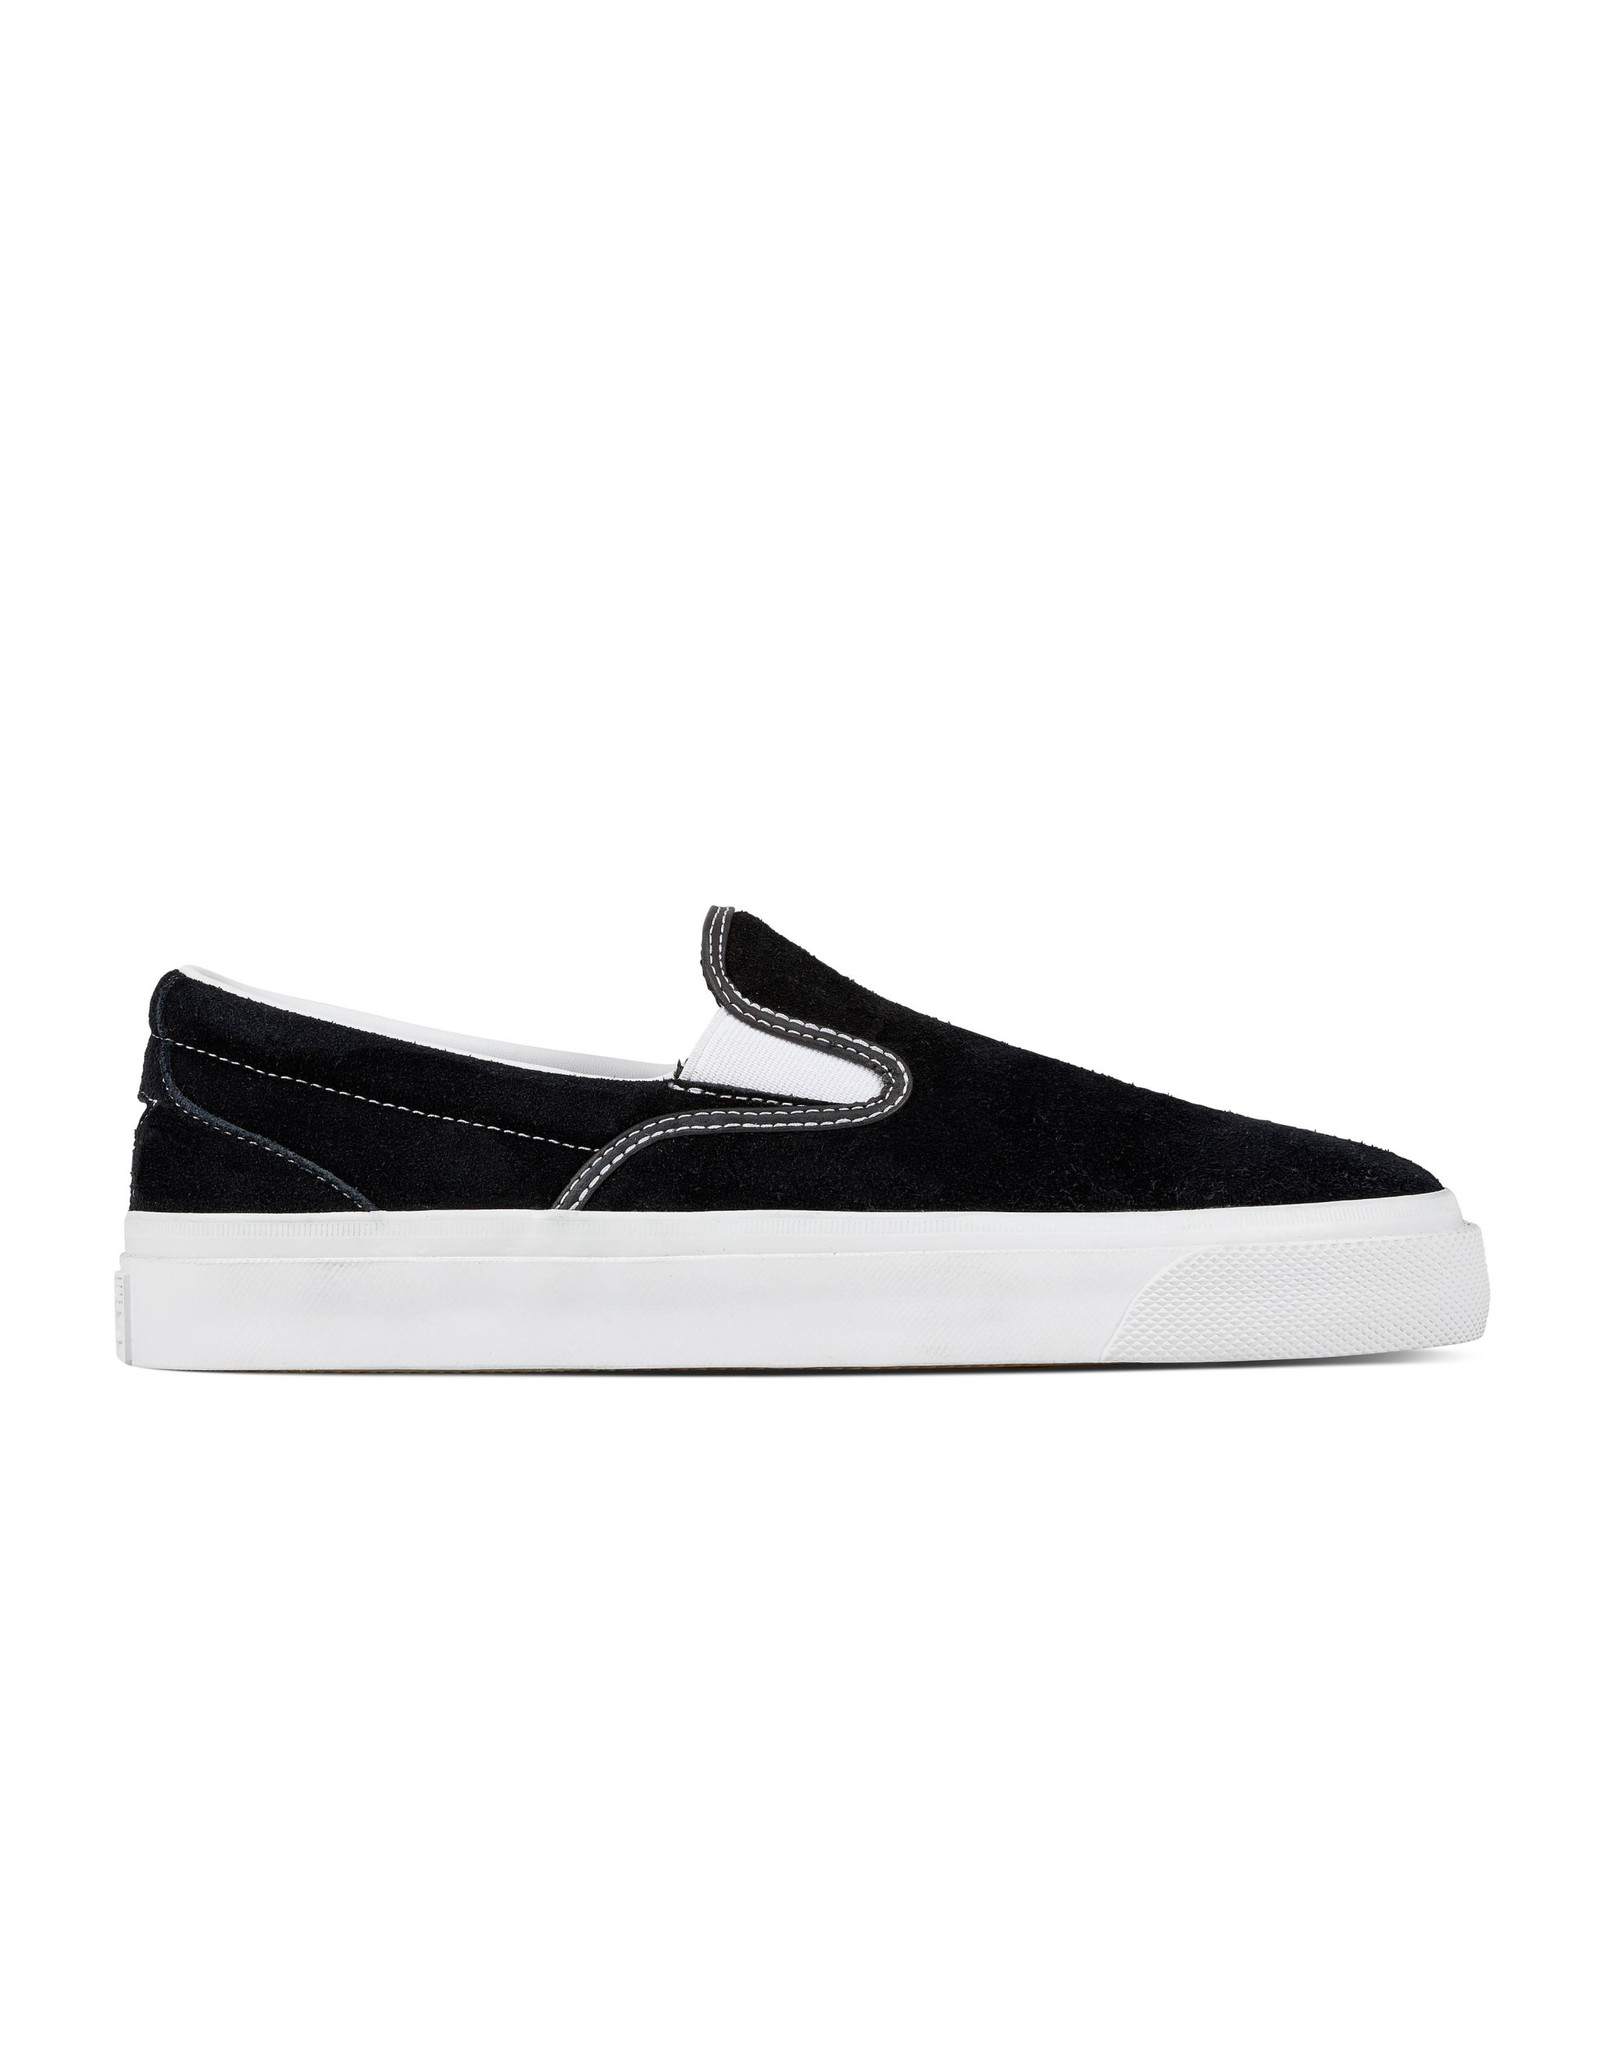 CONVERSE ONE STAR CC SLIP SUEDE PRO BLACK/WHITE/WHITE CS987SPB-160545C